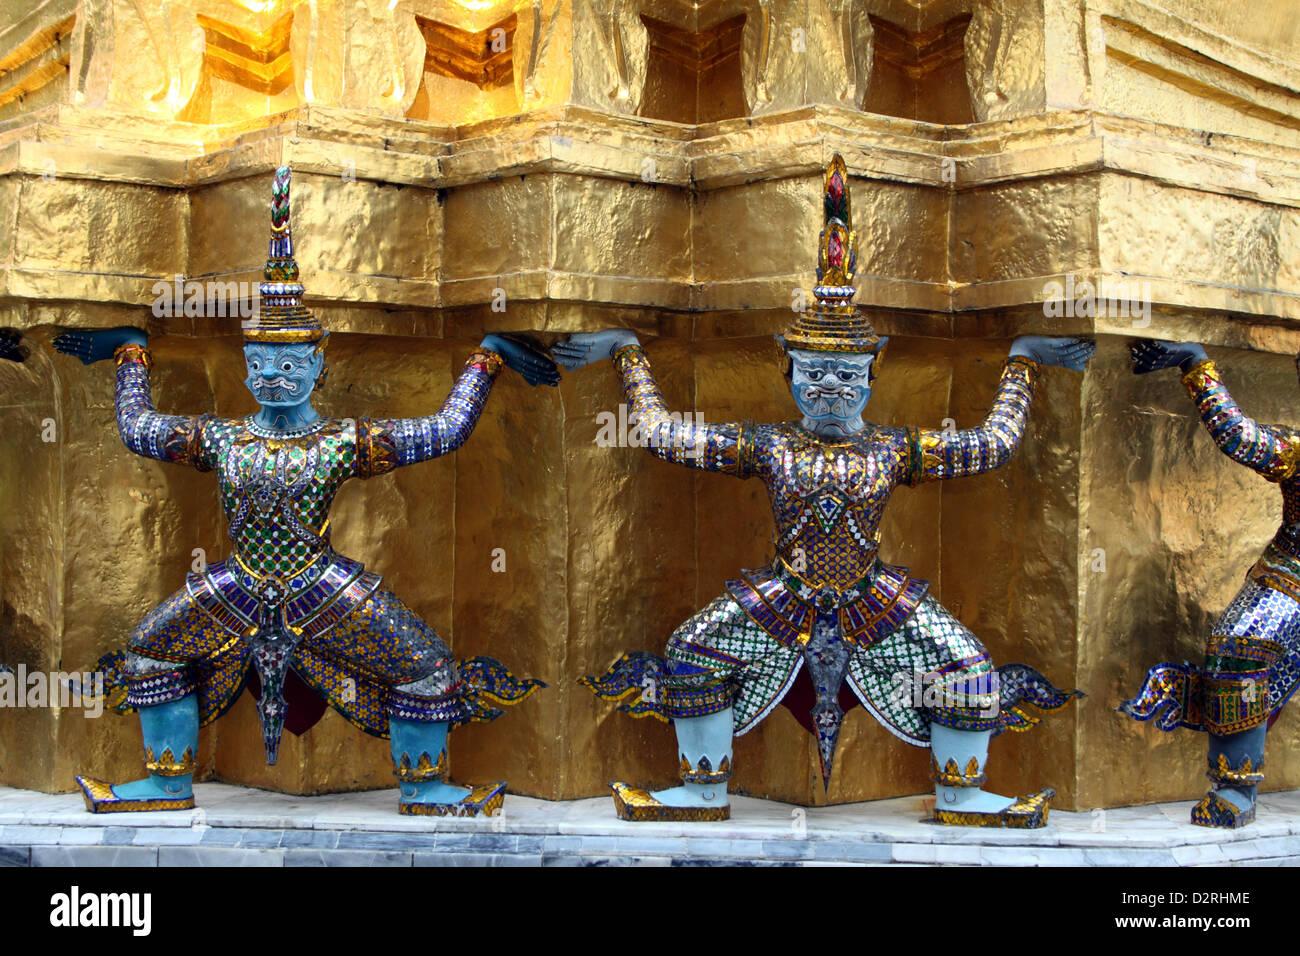 Demons, mythical creatures guarding the Golden Stupa, also known as Phra Sri Ratana Chedi - Grand Palace, Bangkok, - Stock Image